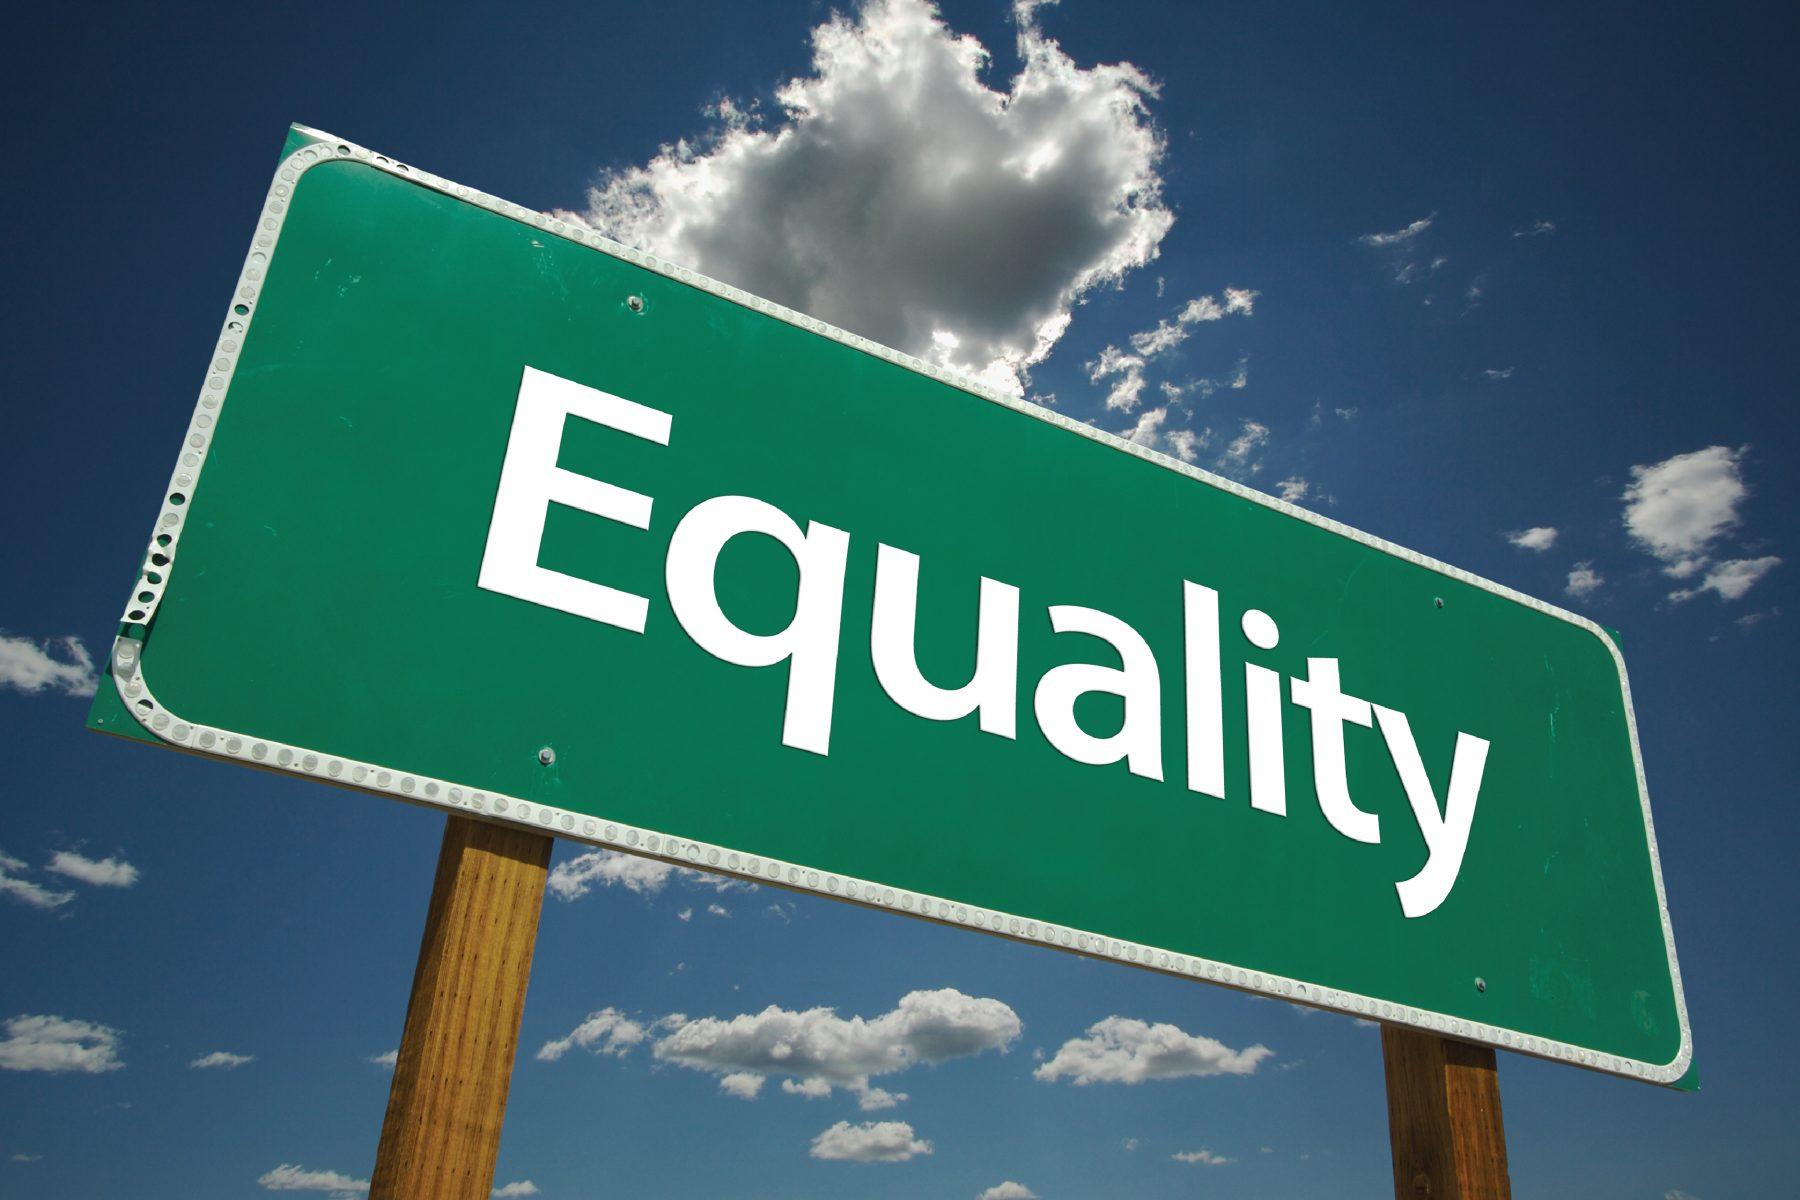 equality_photo-01